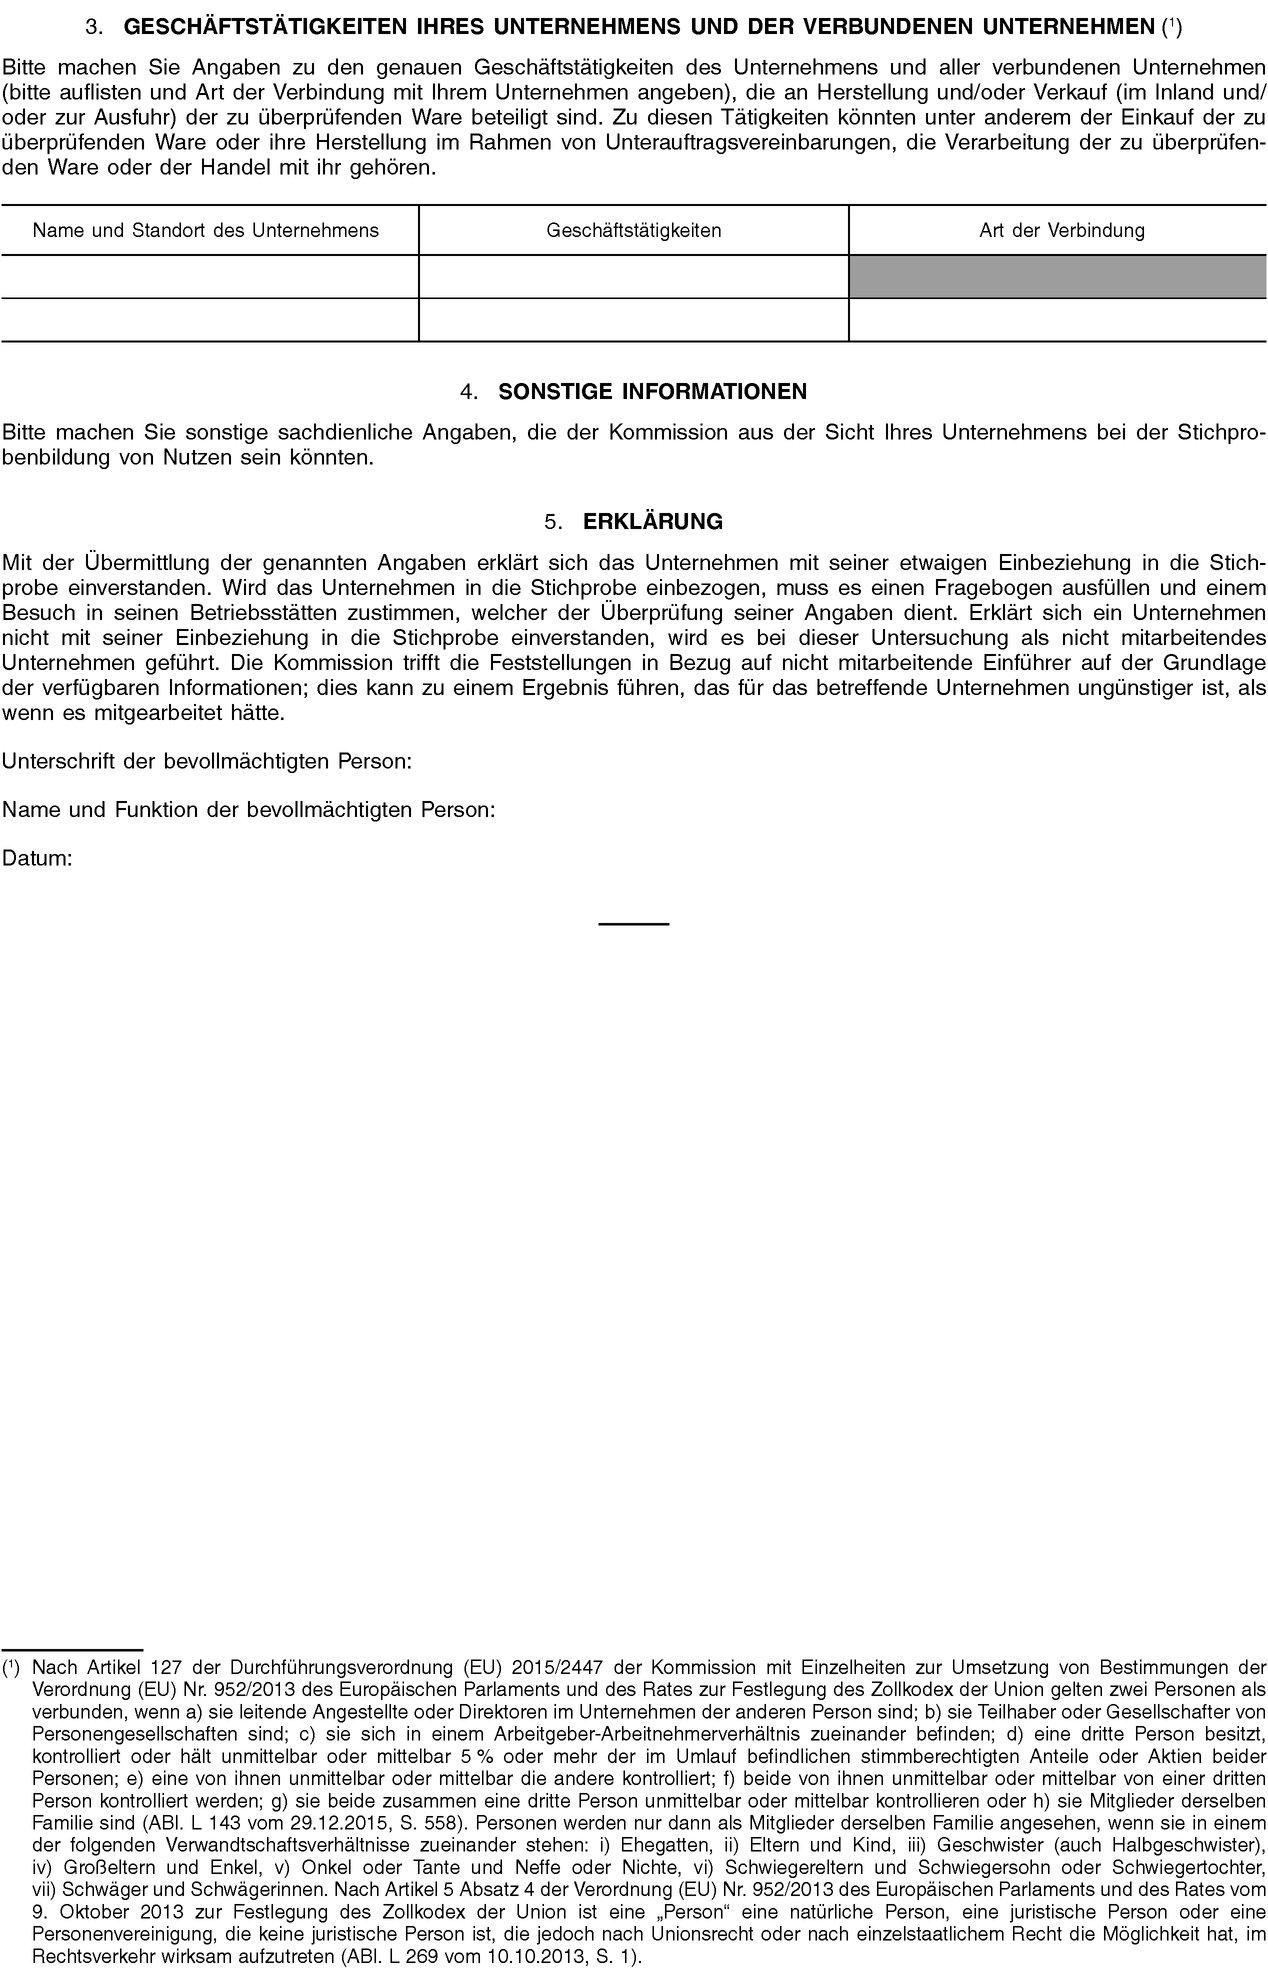 Großartig Produktionsblatt Vorlage Ideen - Entry Level Resume ...